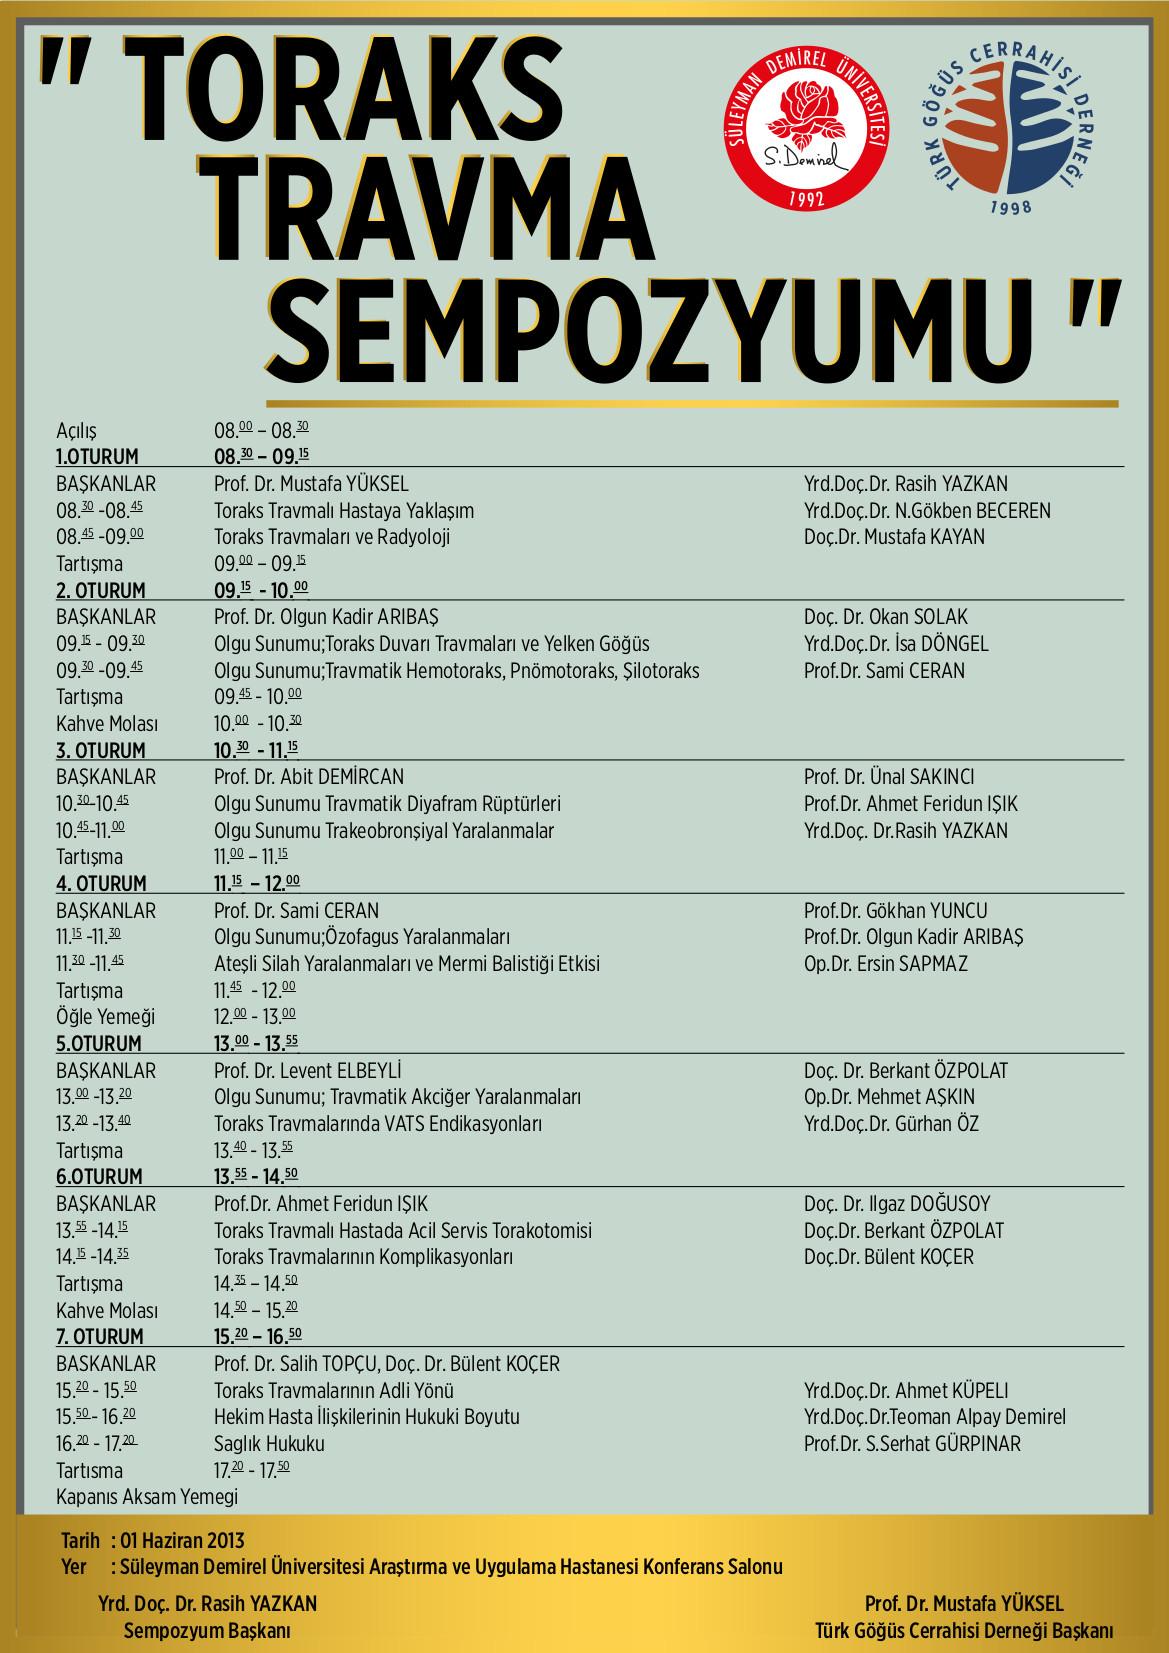 toraks-travma-sempozyumu-2013